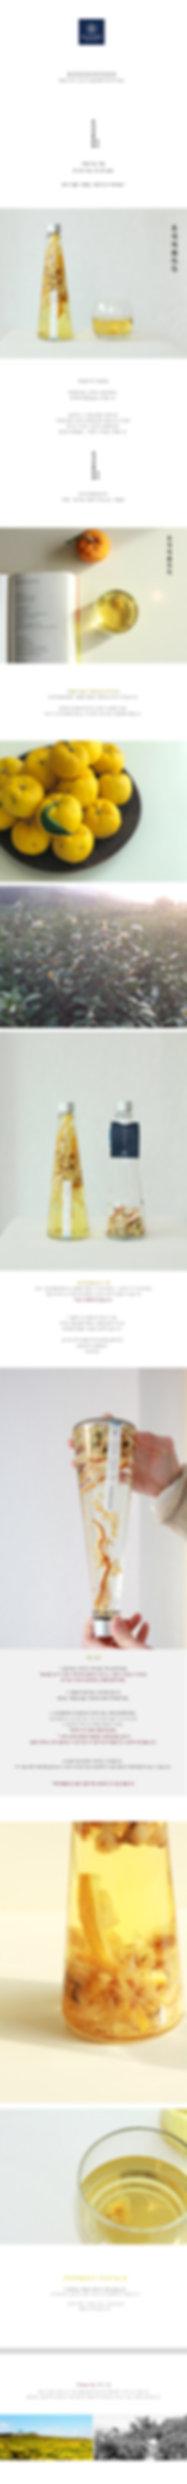 product page_유자차화동동_190712.jpg